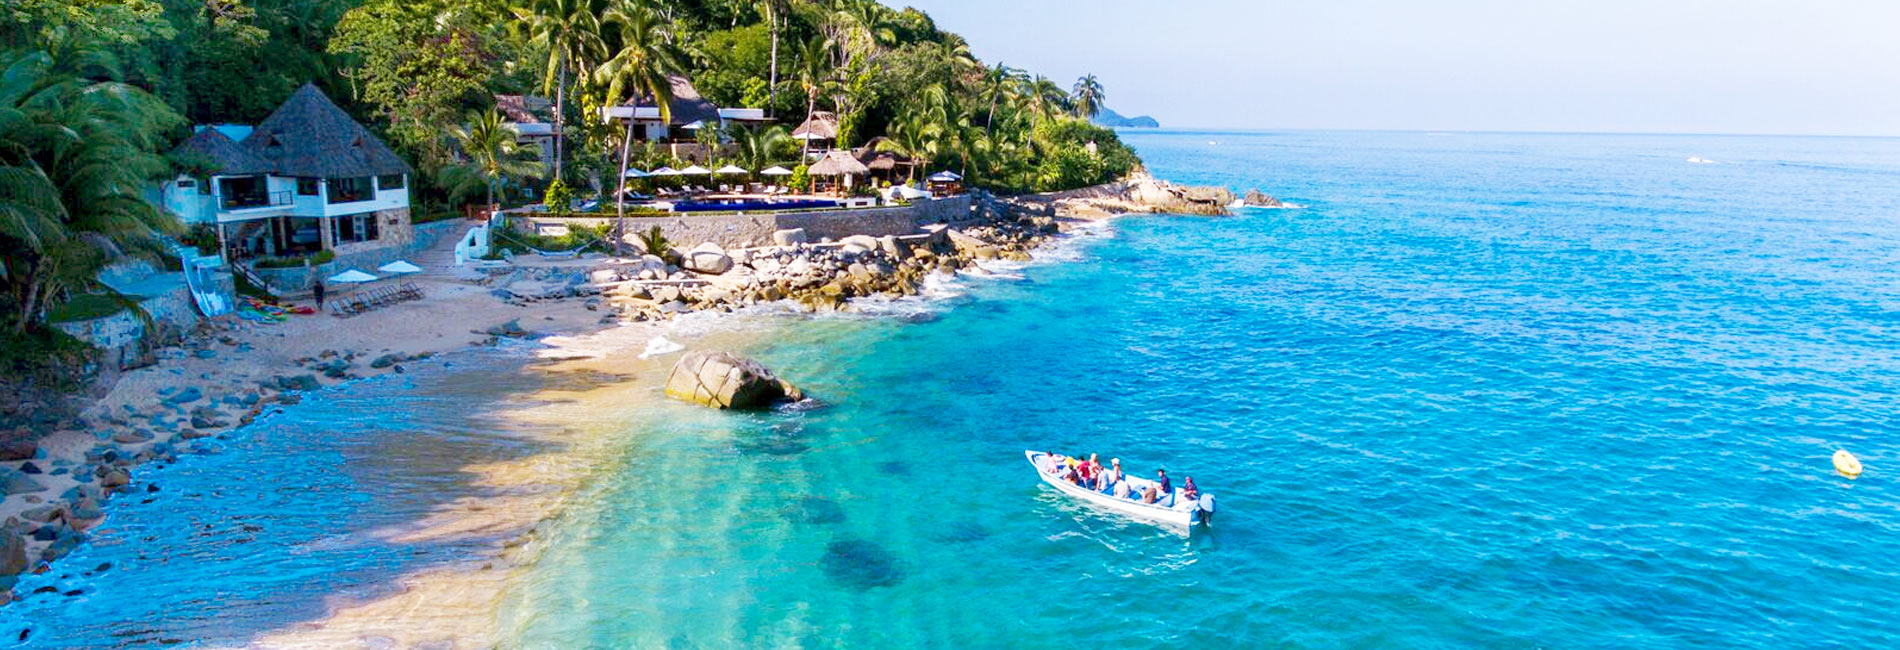 villa-vacation-ideas